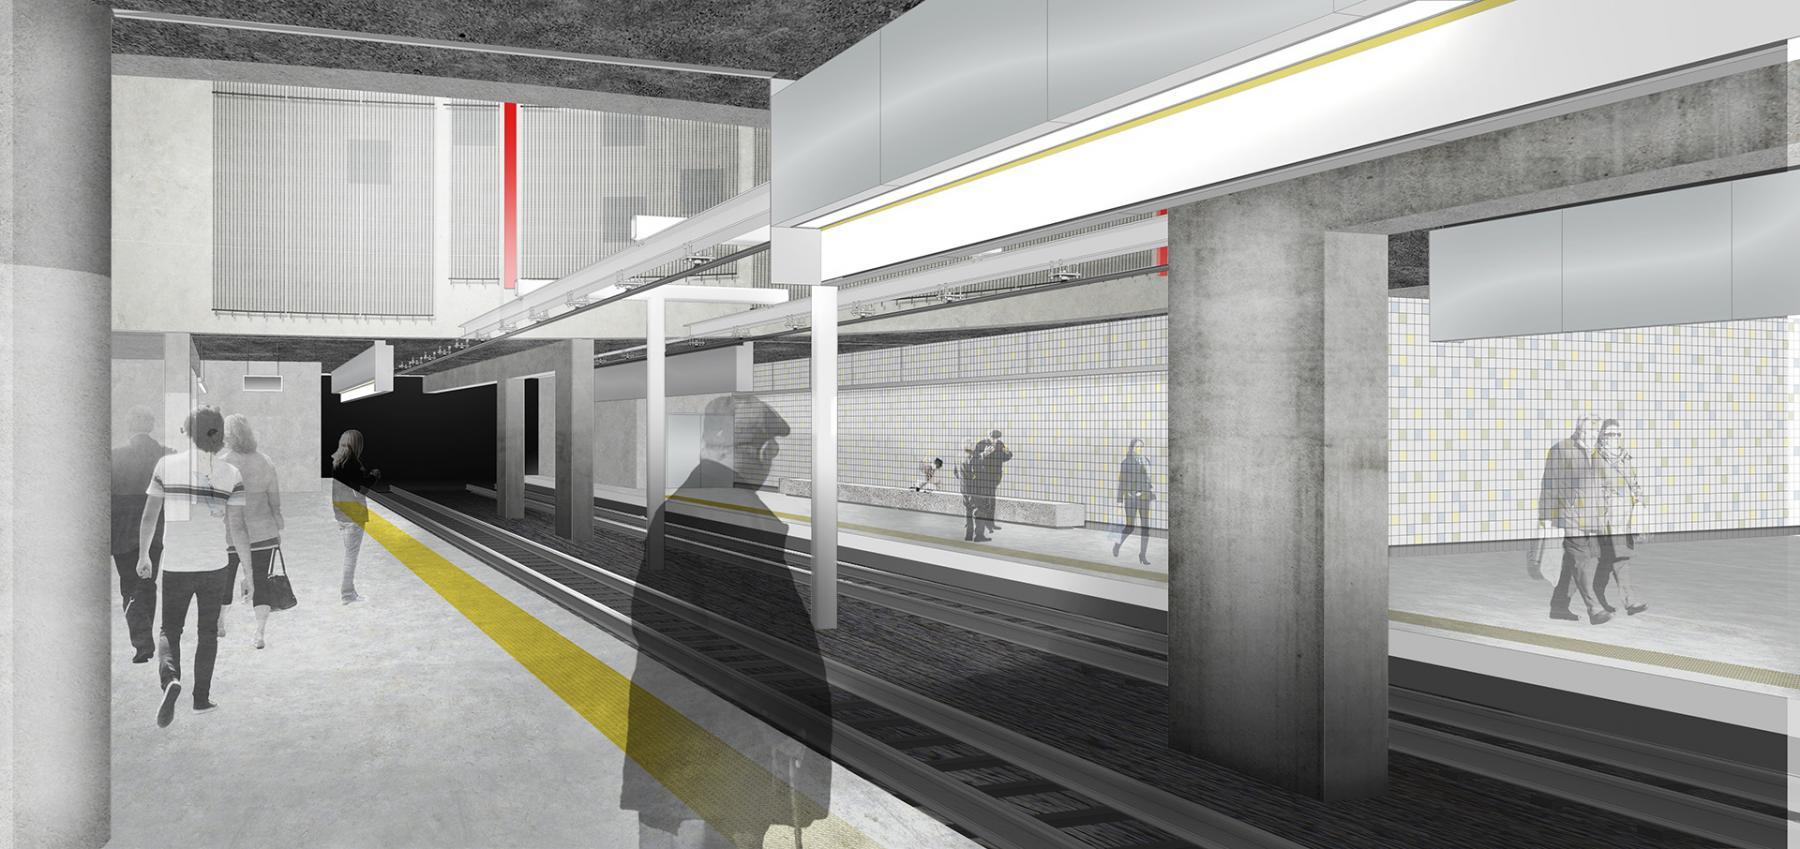 het vernieuwde premetrostation Opera